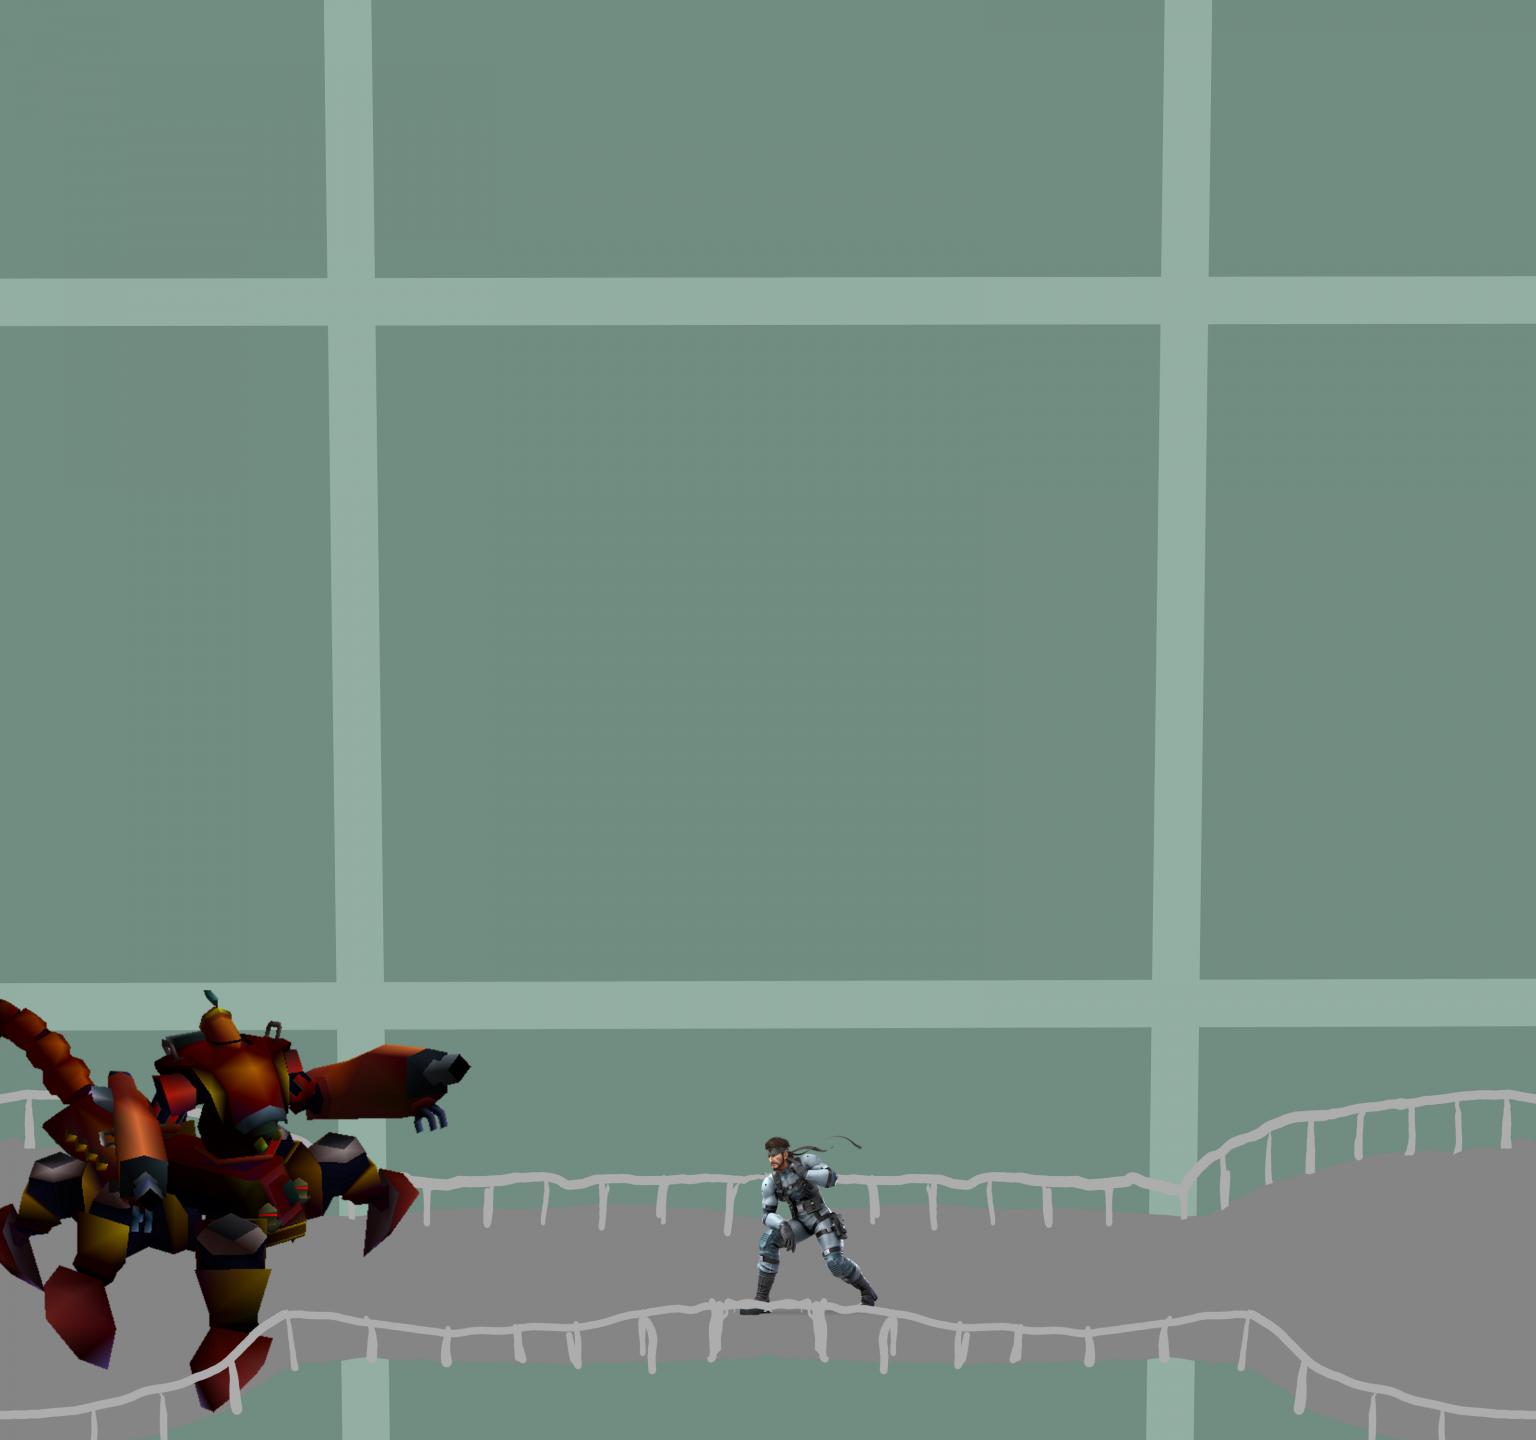 Scorpion_Sentinel.png